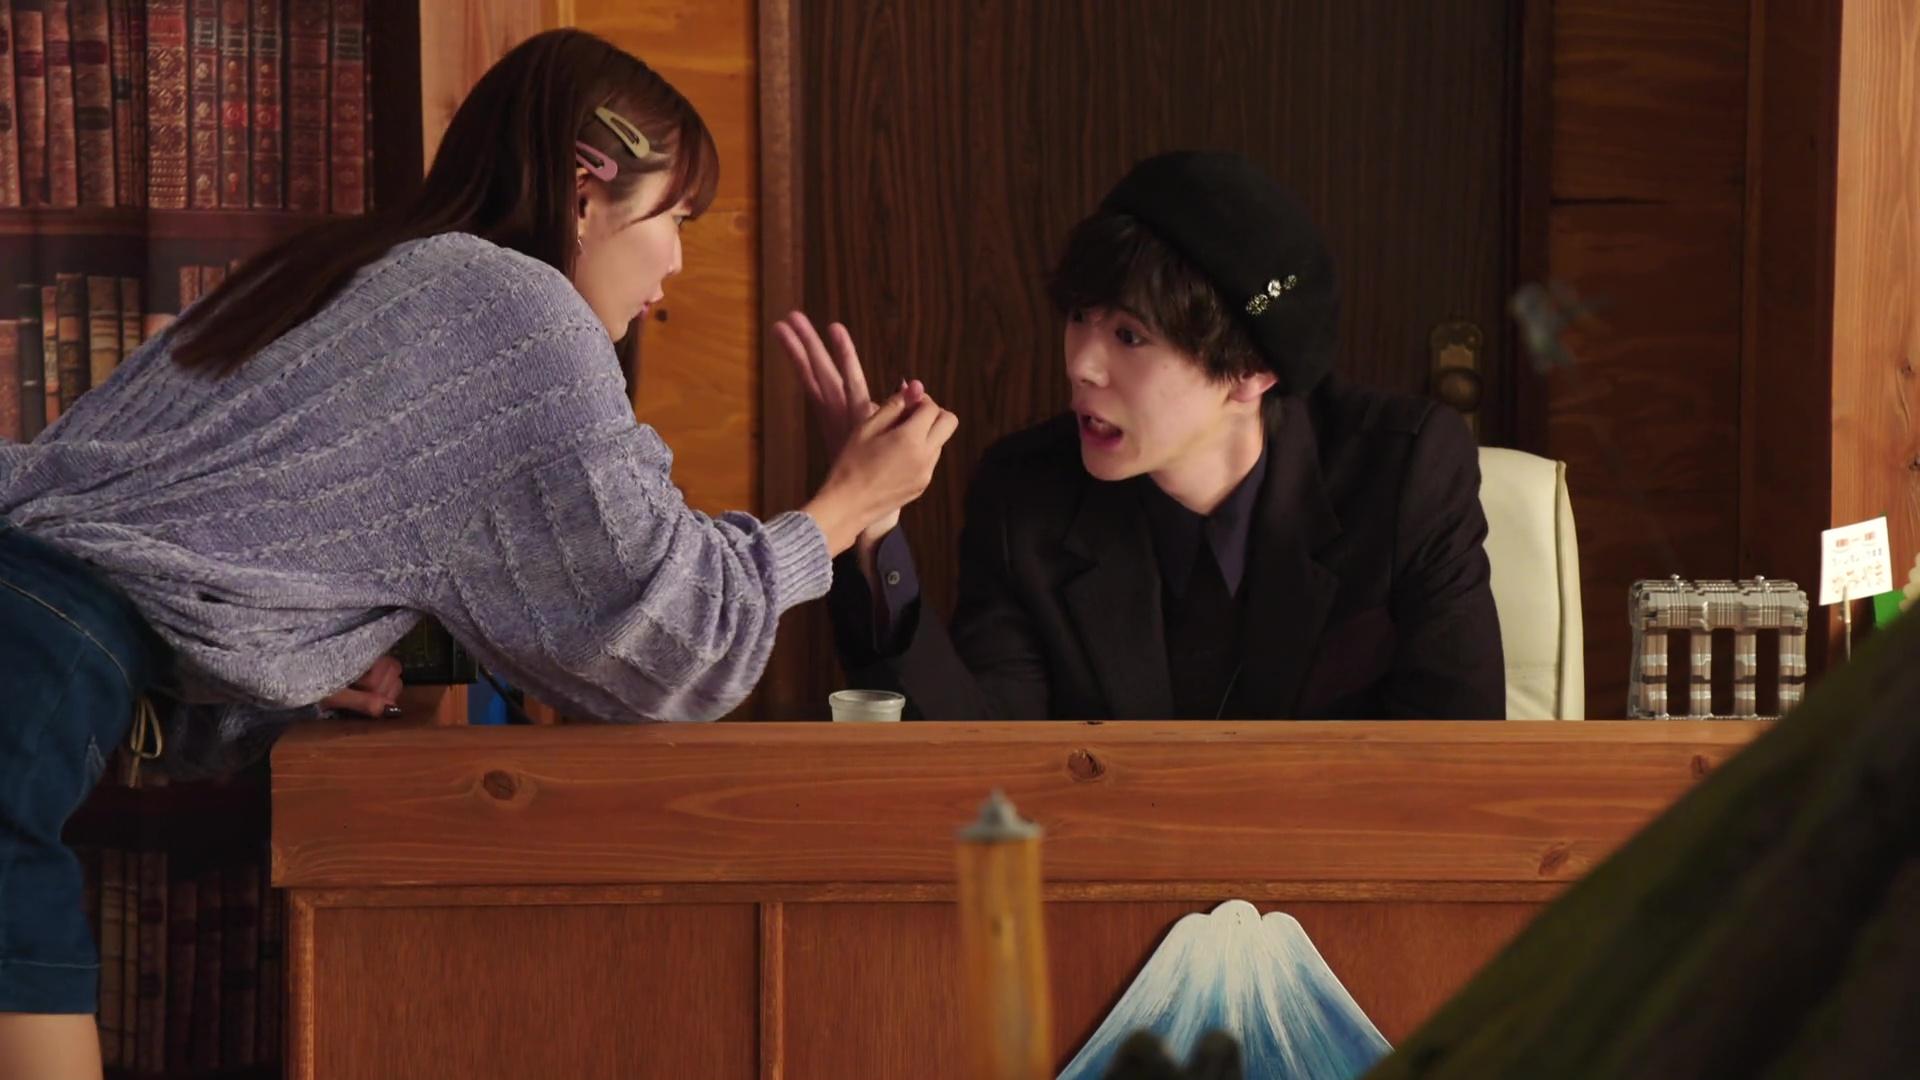 Kamen Rider Saber Episode 11 Recap